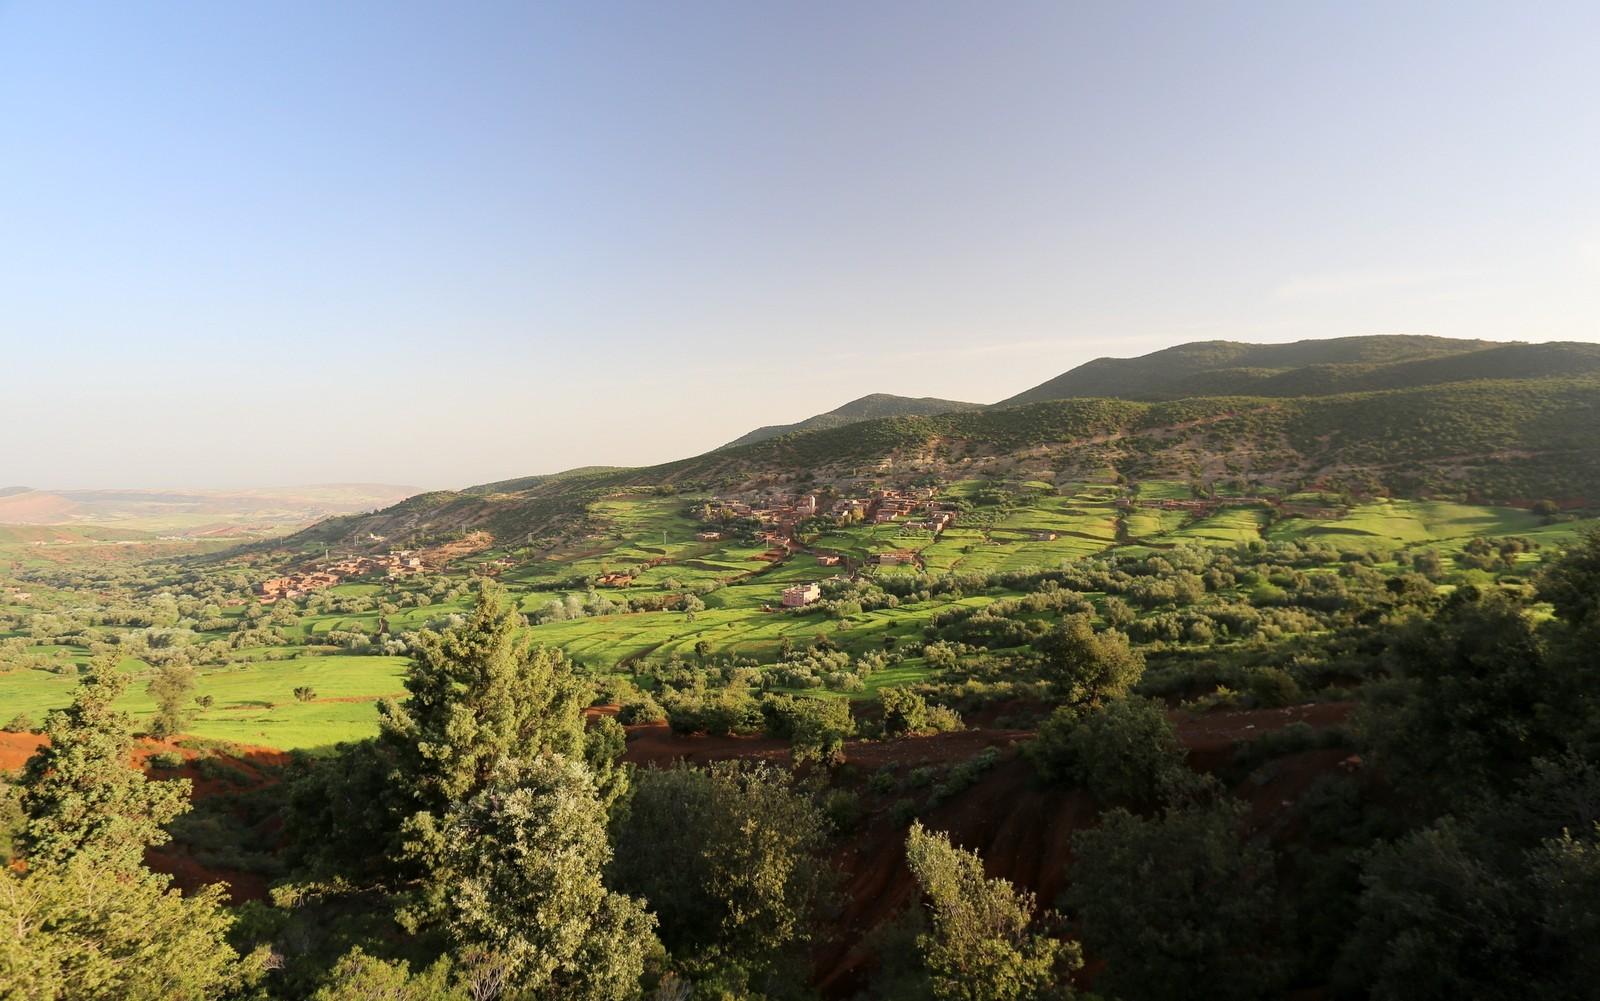 Atlasvuoret Marocco Morocco